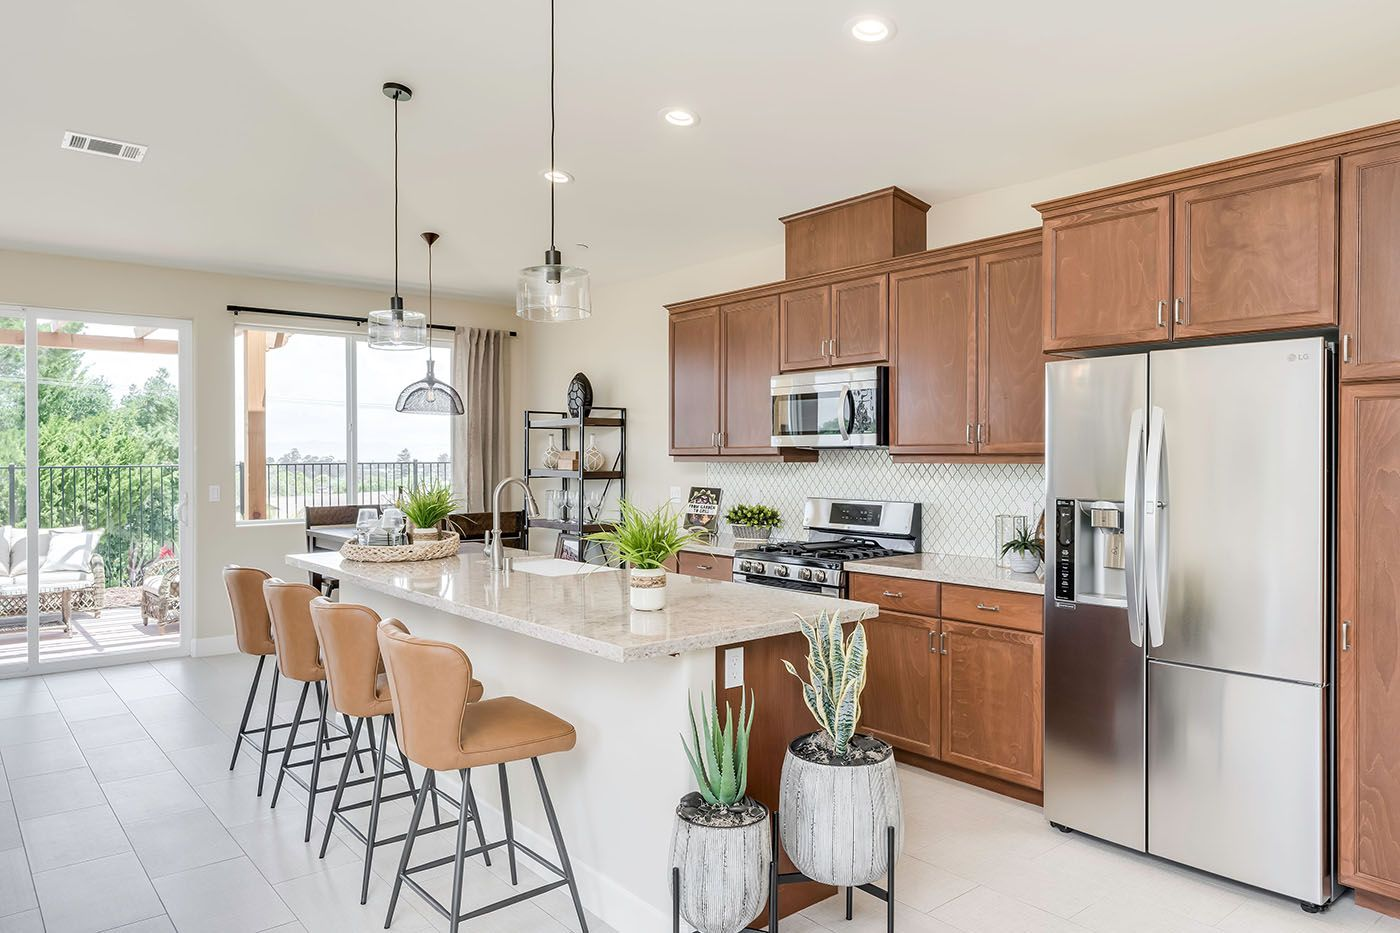 Kitchen featured in the Willowglen By Coastal Community Builders in Santa Barbara, CA